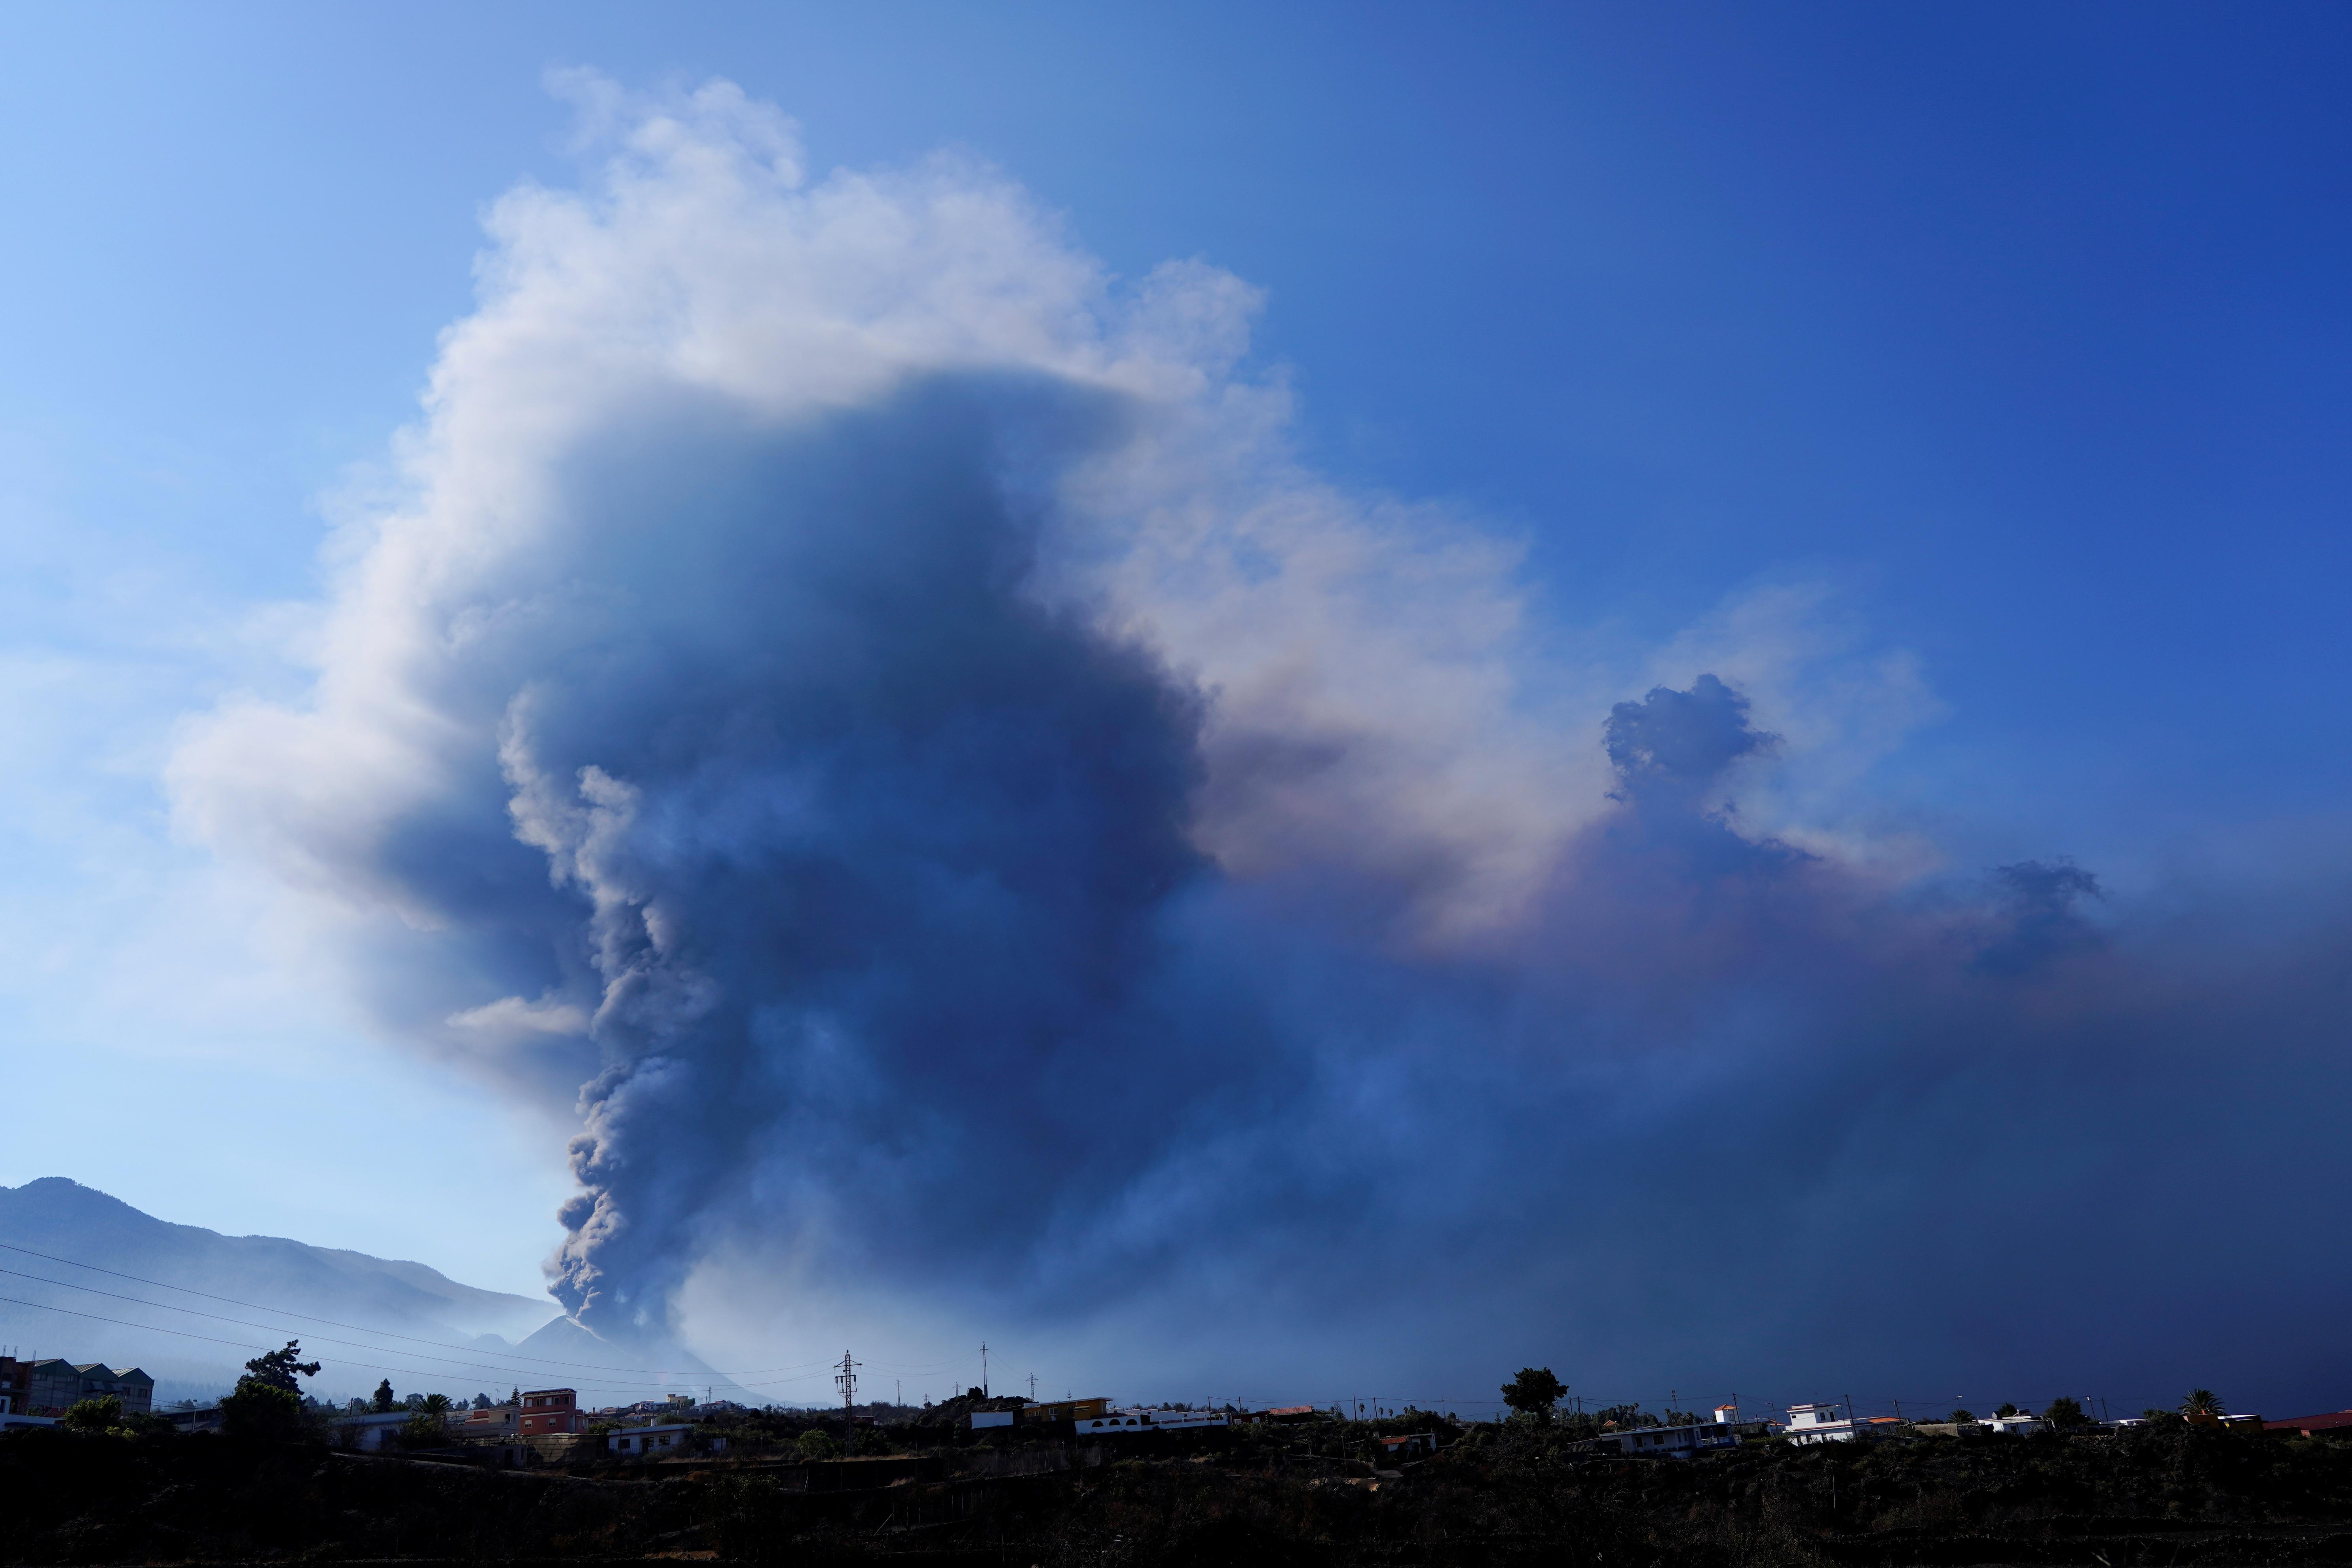 The Cumbre Vieja volcano continues to erupt on the Canary Island of La Palma, as seen from El Paso, Spain, October 9, 2021. REUTERS/Juan Medina